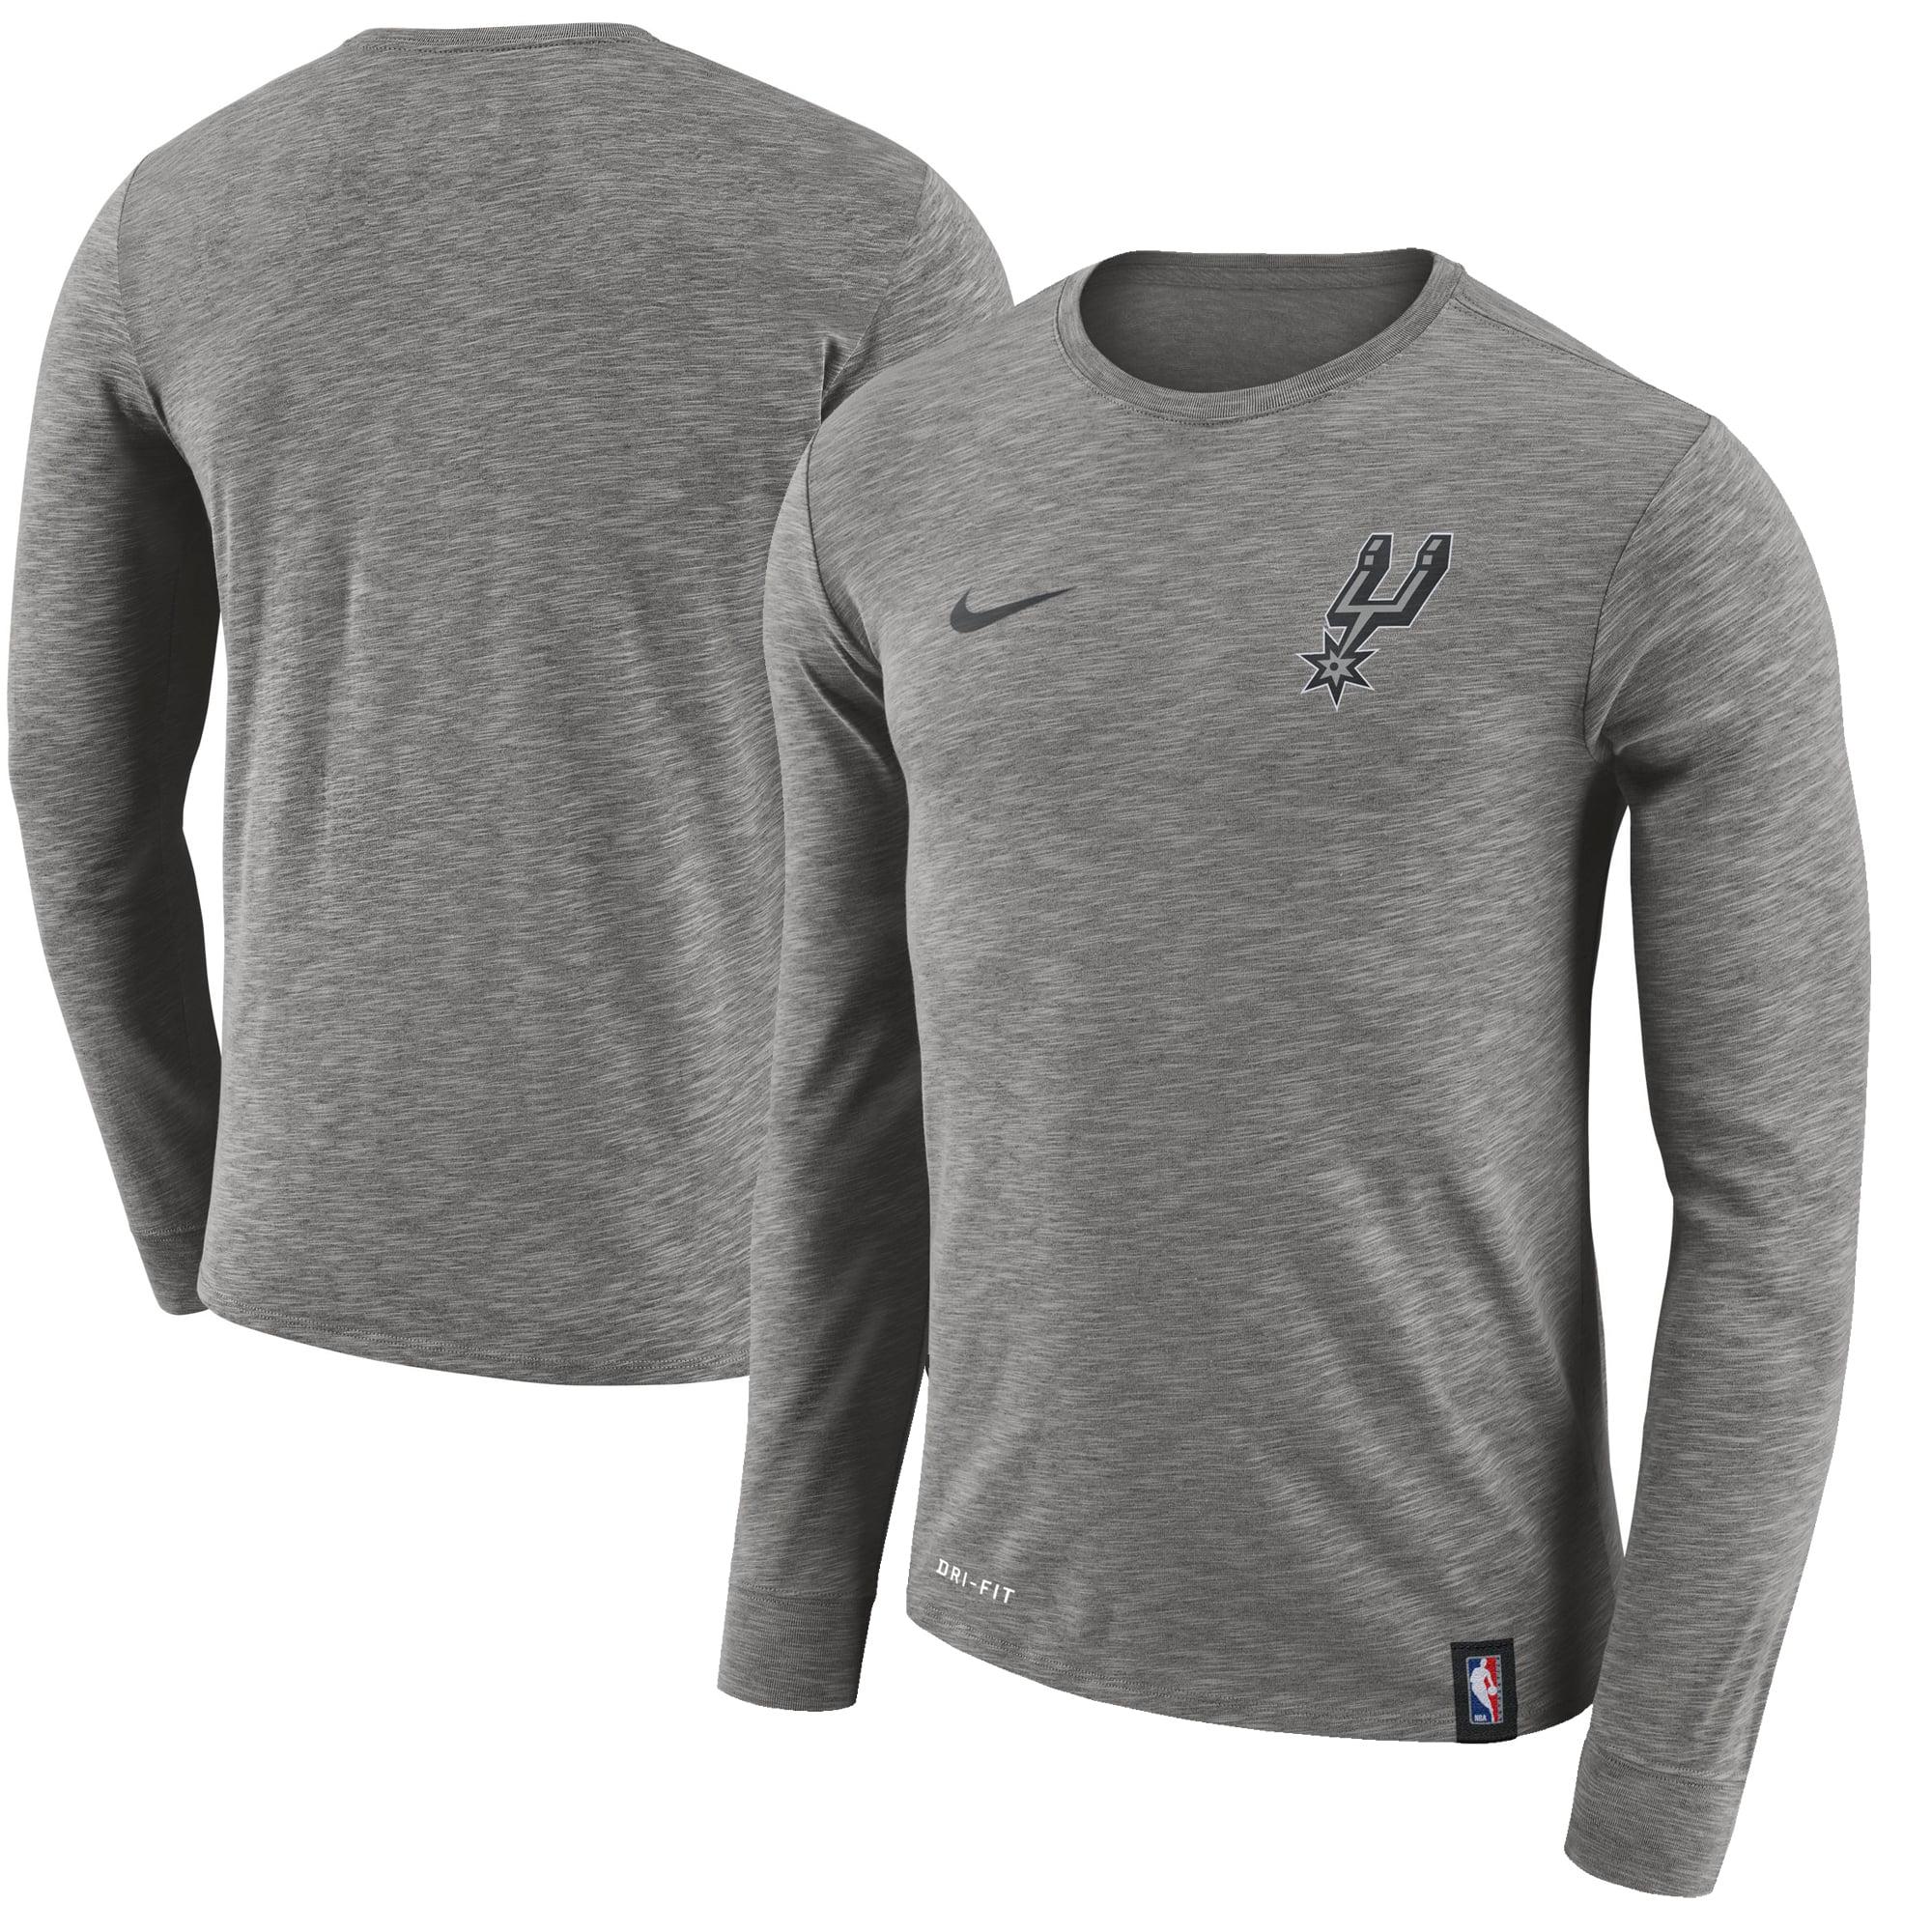 San Antonio Spurs Nike Facility Long Sleeve T-Shirt - Gray - XXL